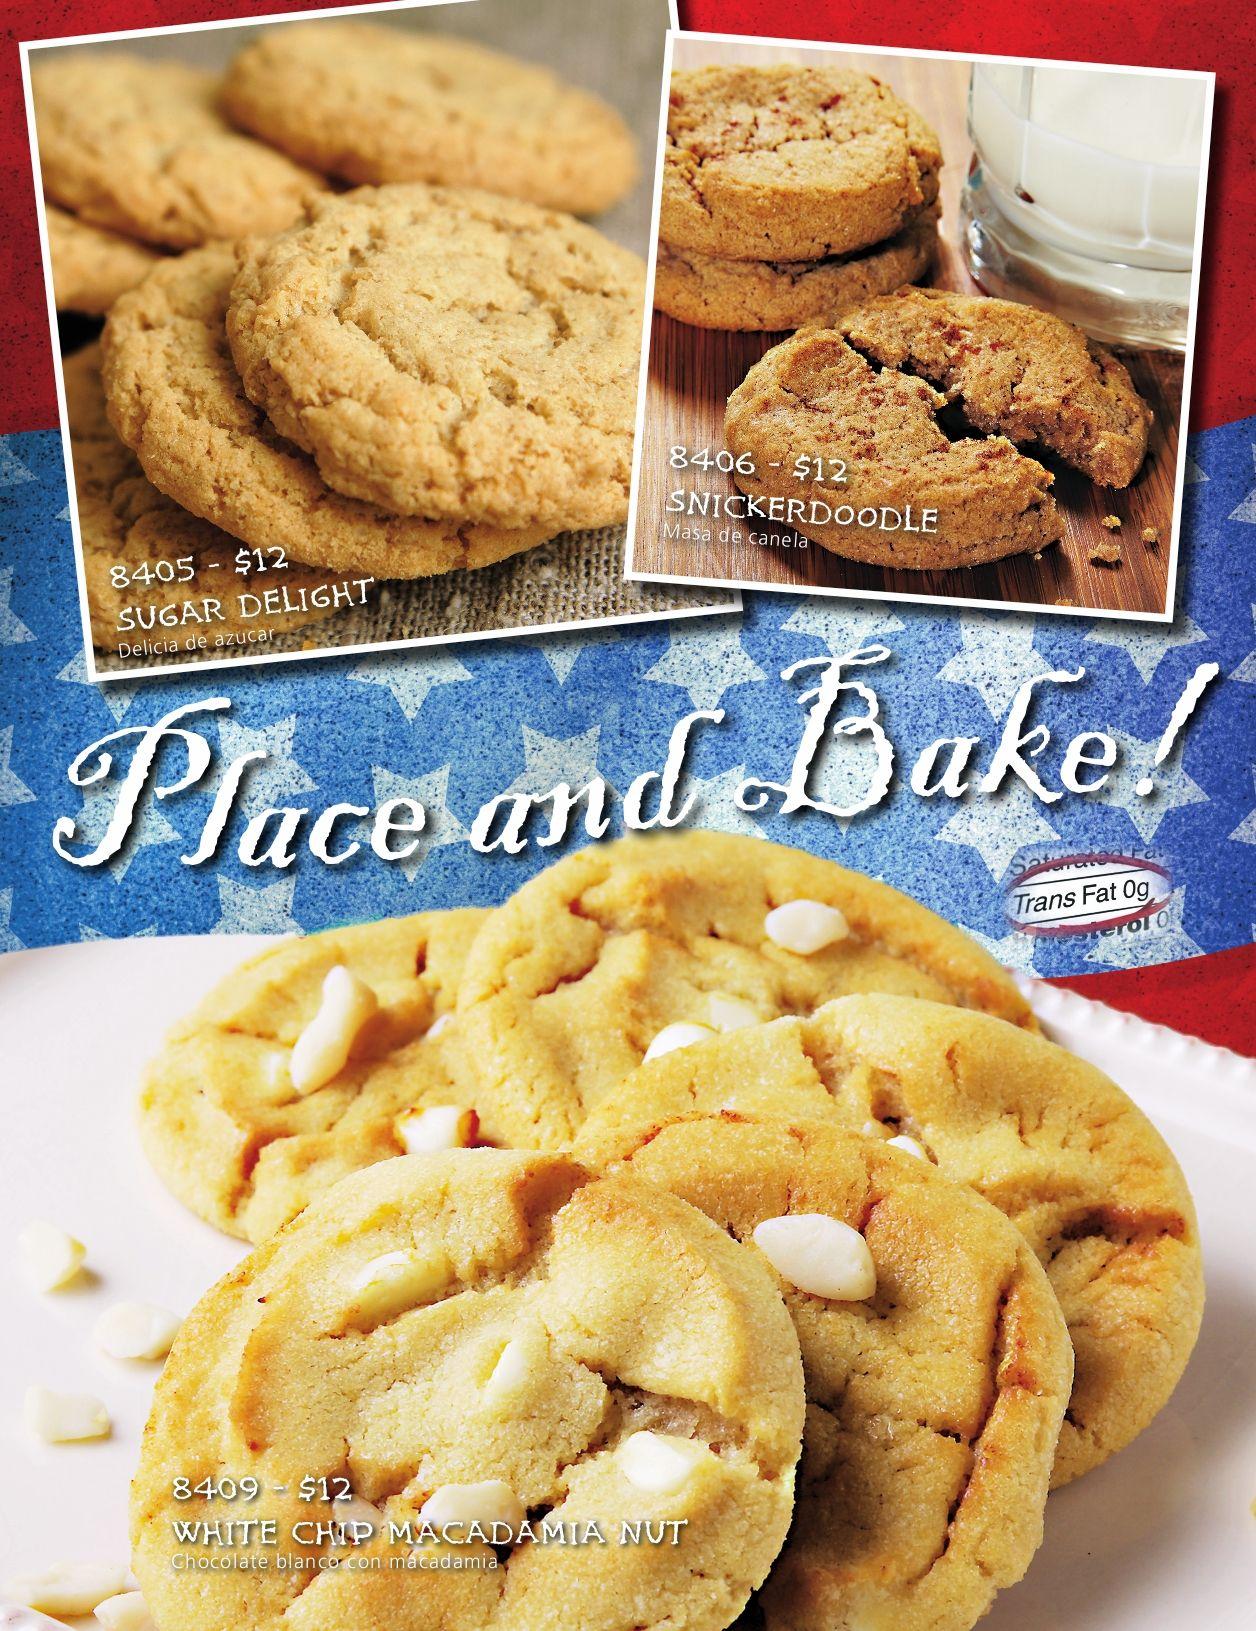 Cookie dough fundraiser cookie dough fundraiser cookie